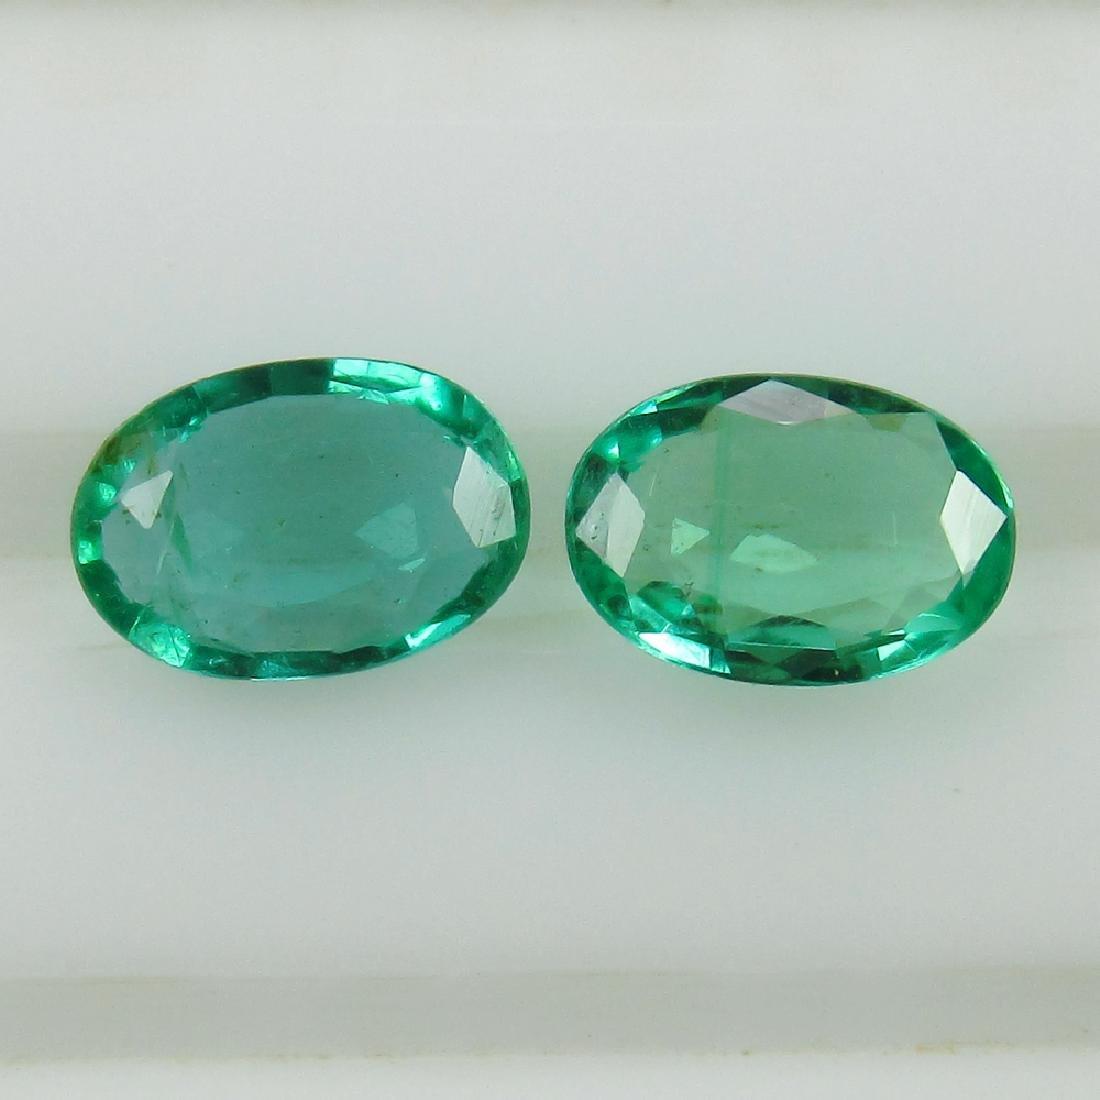 0.72 Ct Genuine Zambian Emerald Matching Oval Pair